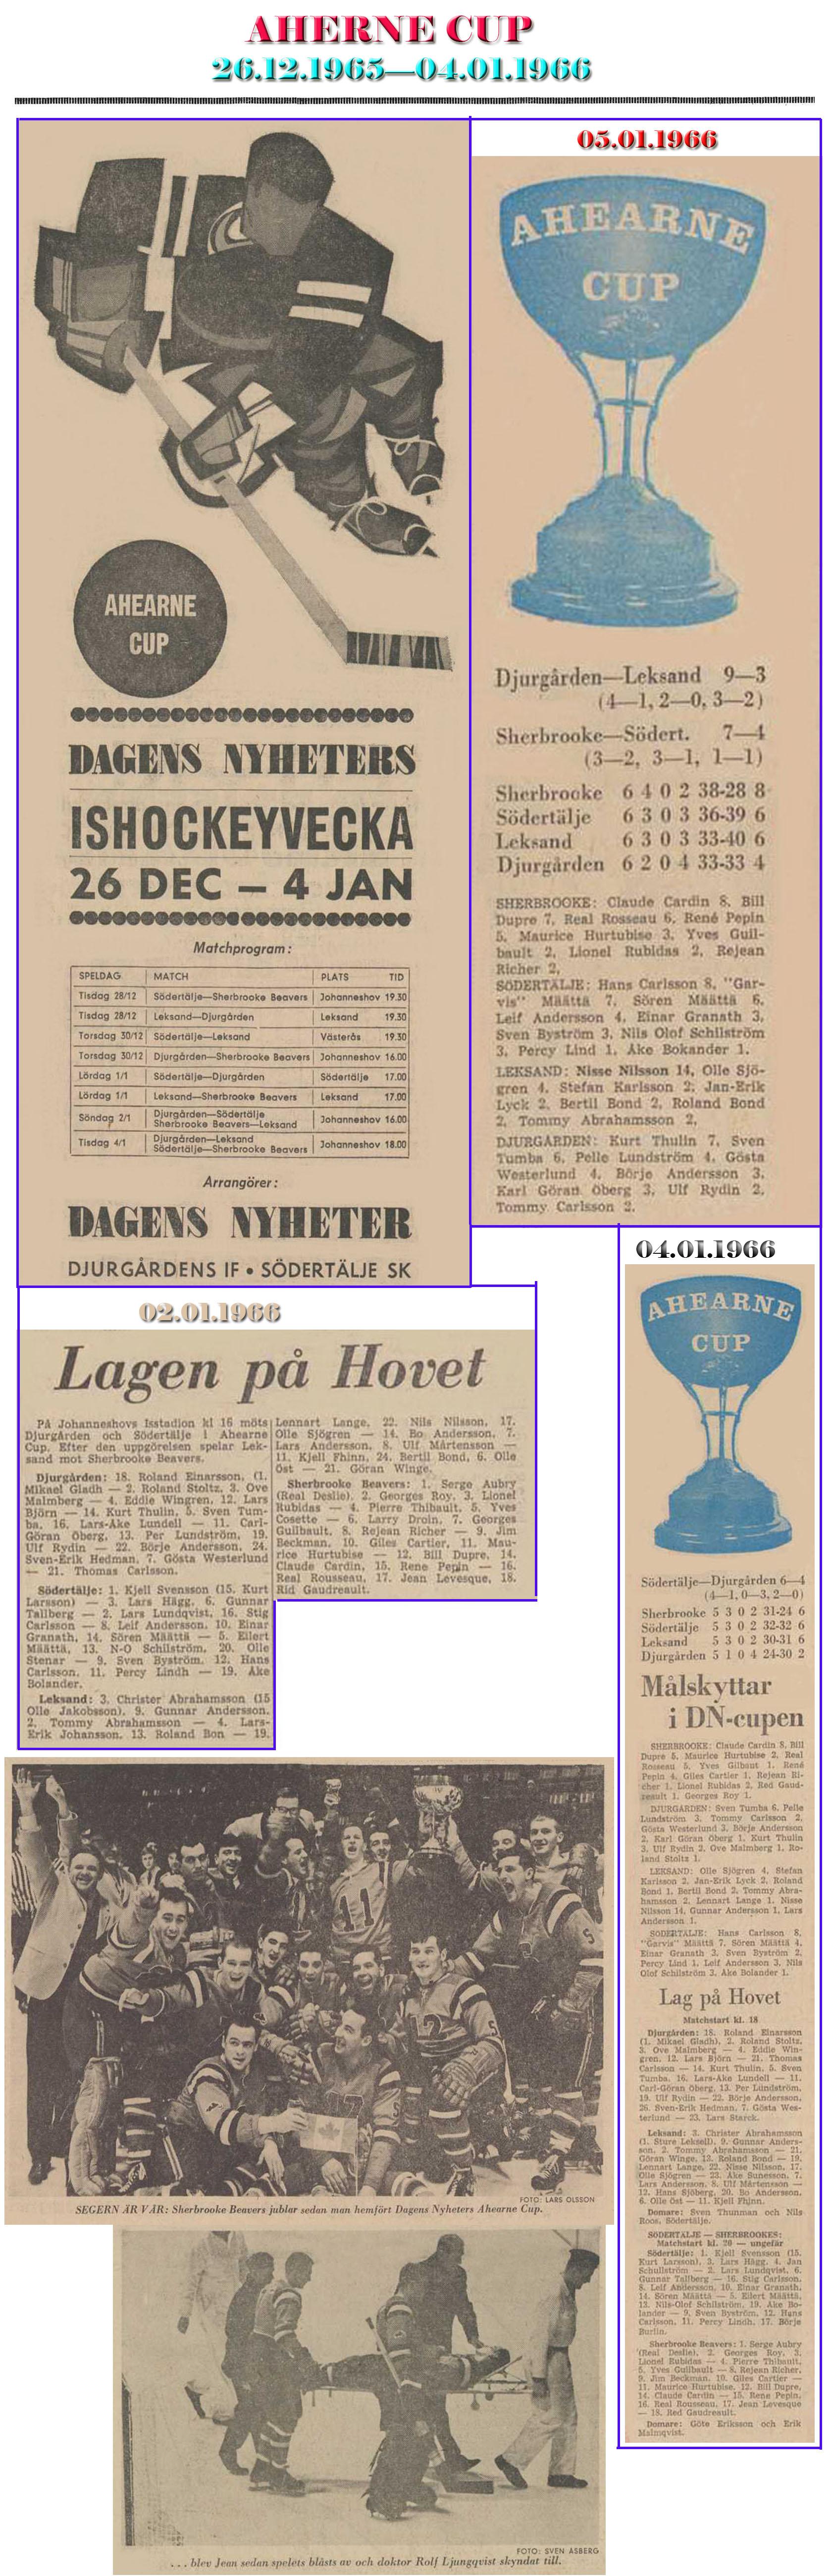 1965-1966.Кубок Ахерна.jpg